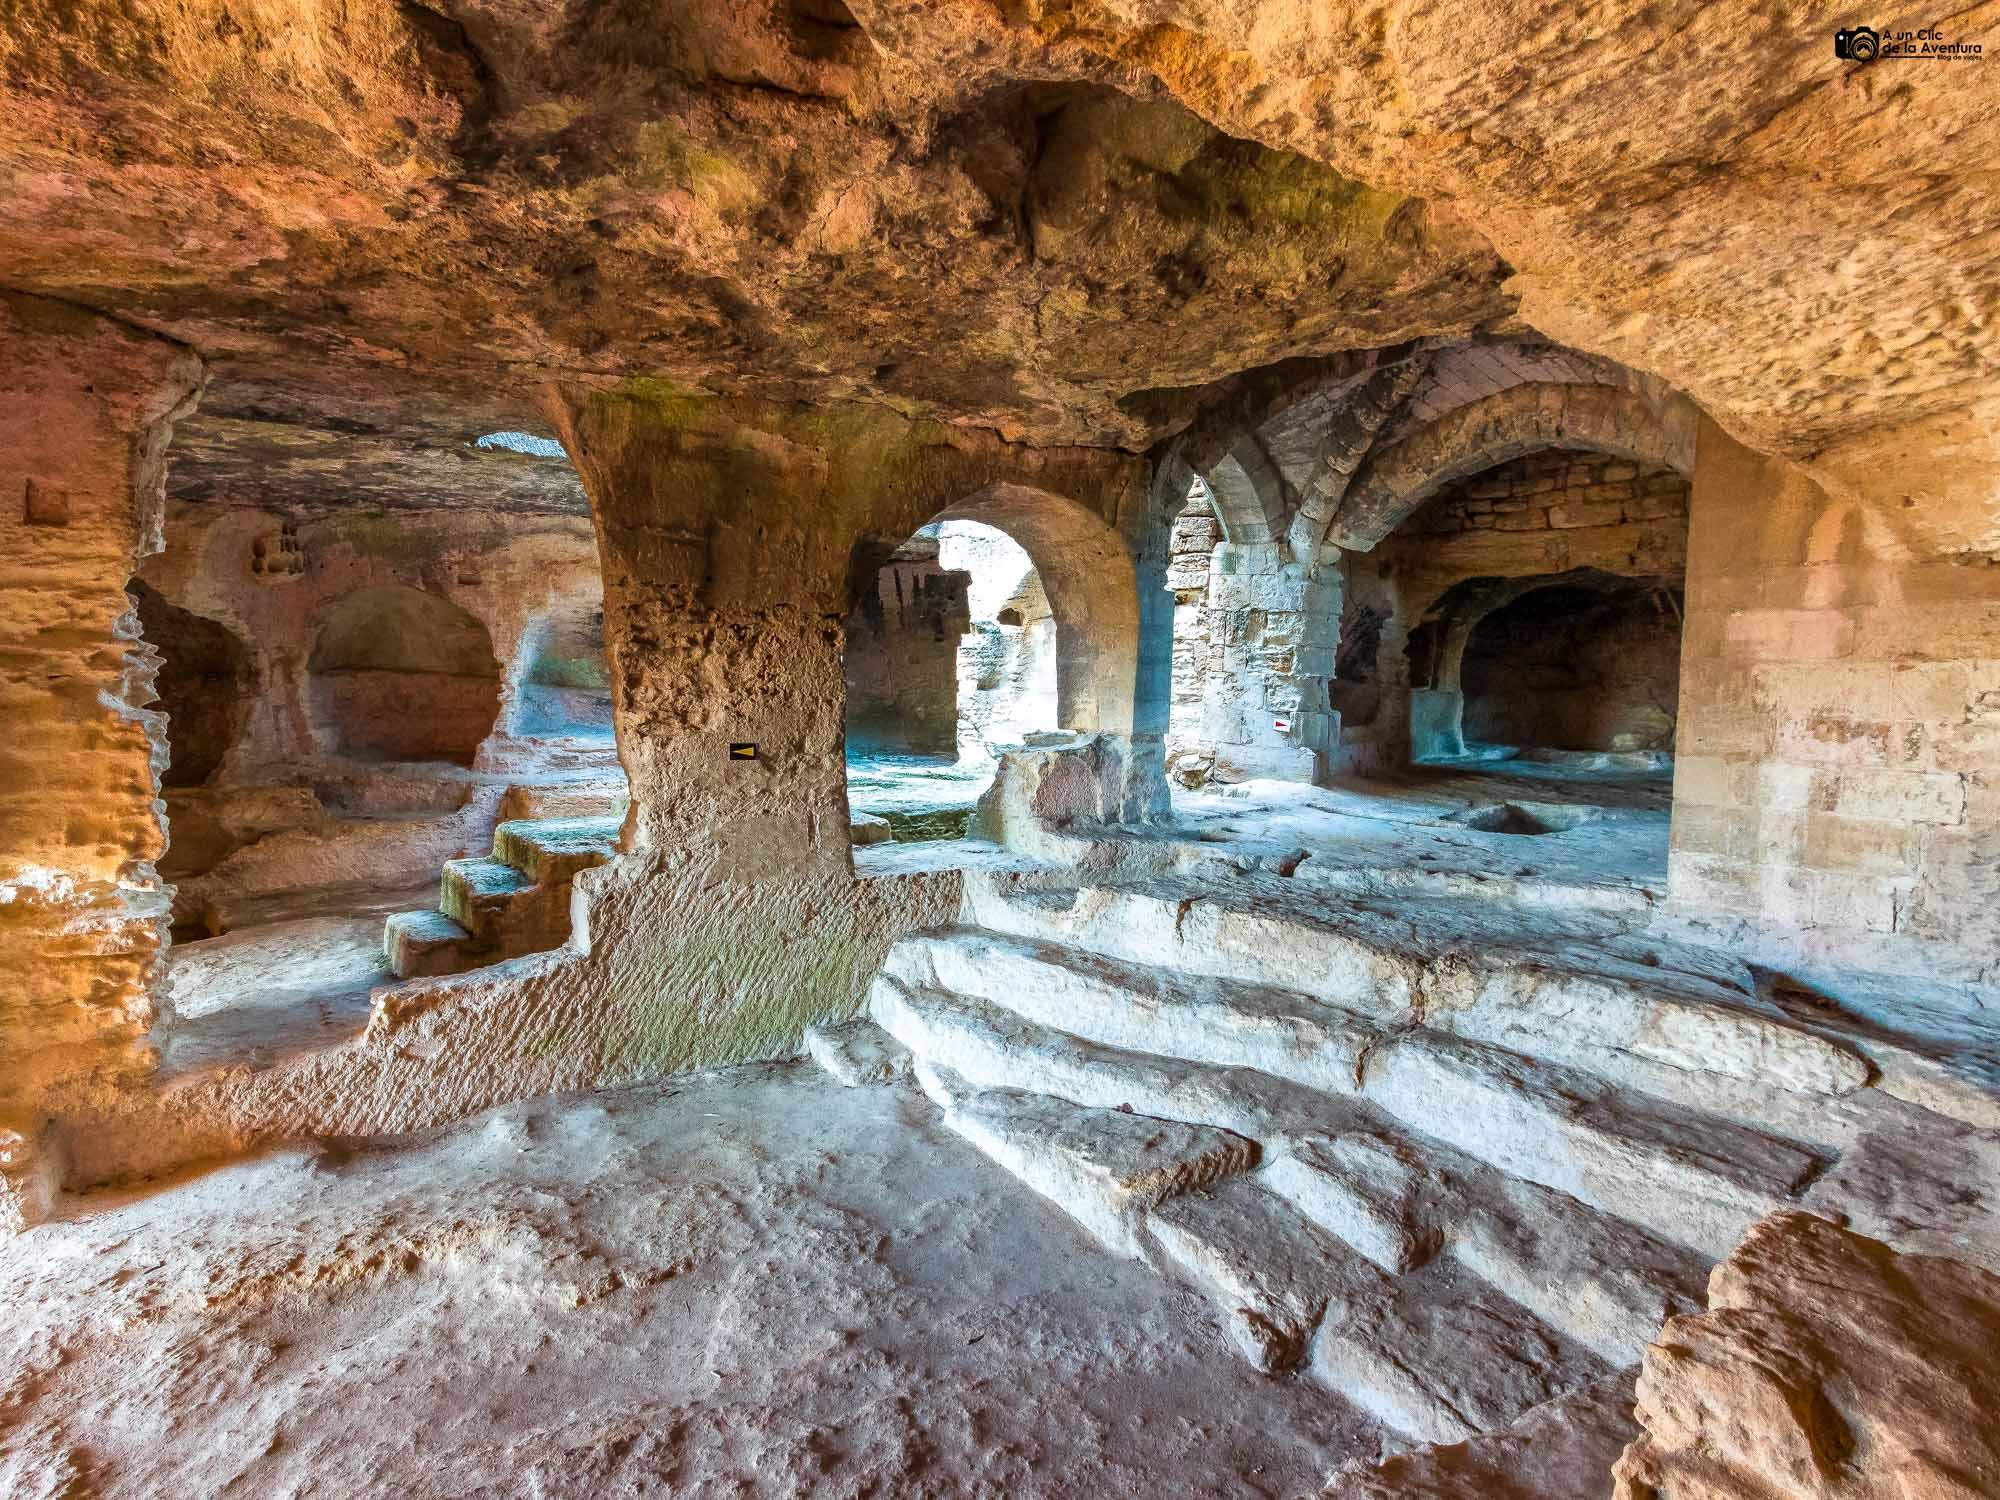 Abadía troglodita de Saint-Roman